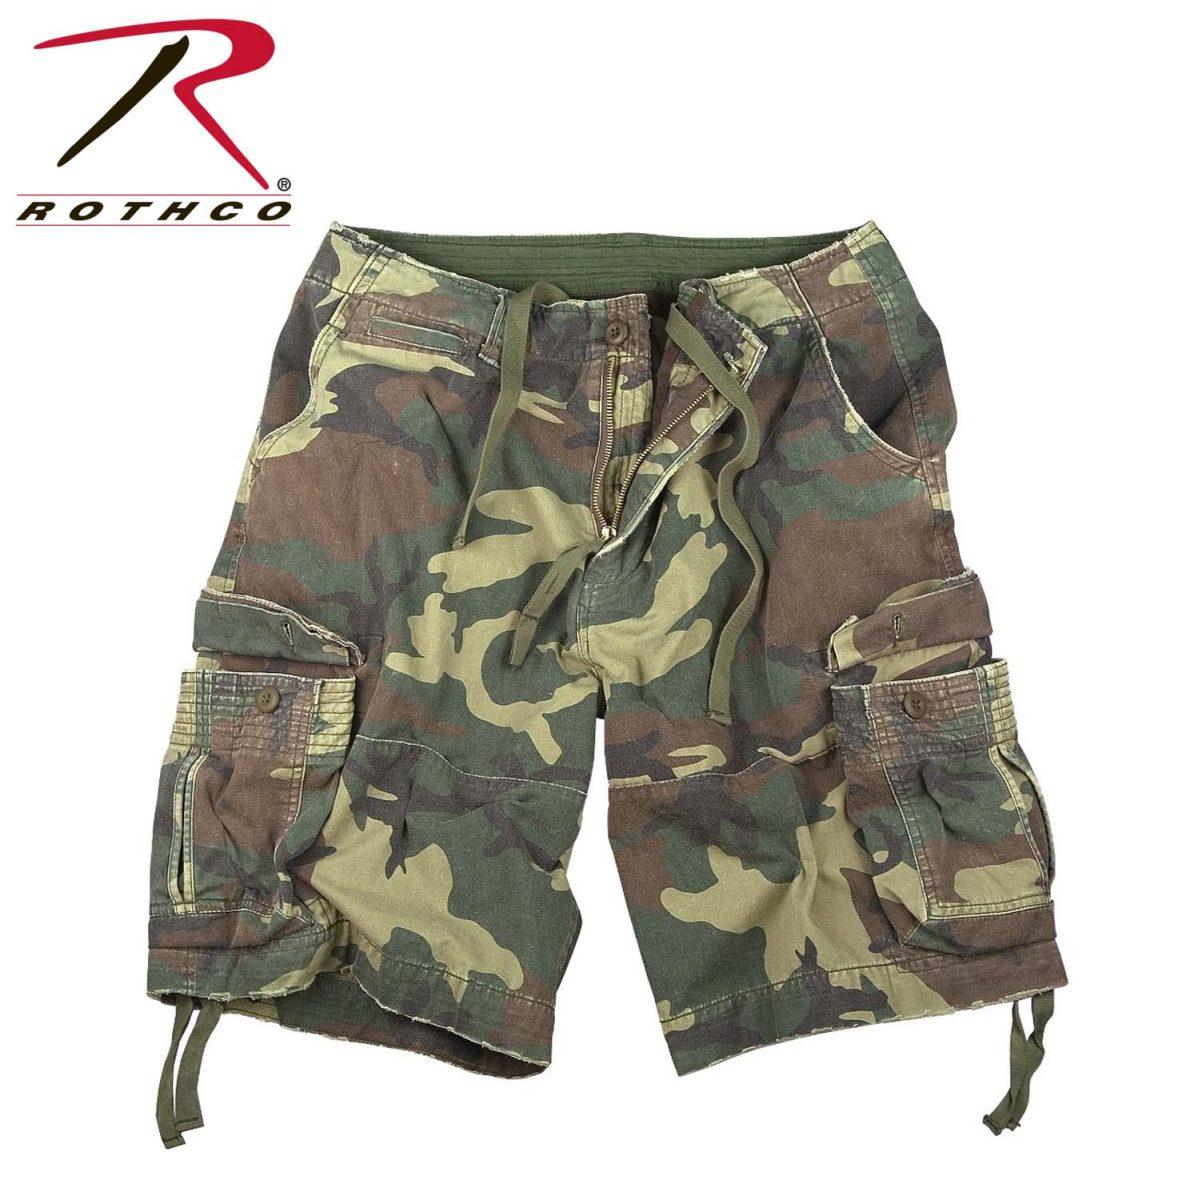 ebfdd7ff7e1 Buy Rothco Vintage Camo Infantry Utility Shorts - Rothco Online at ...